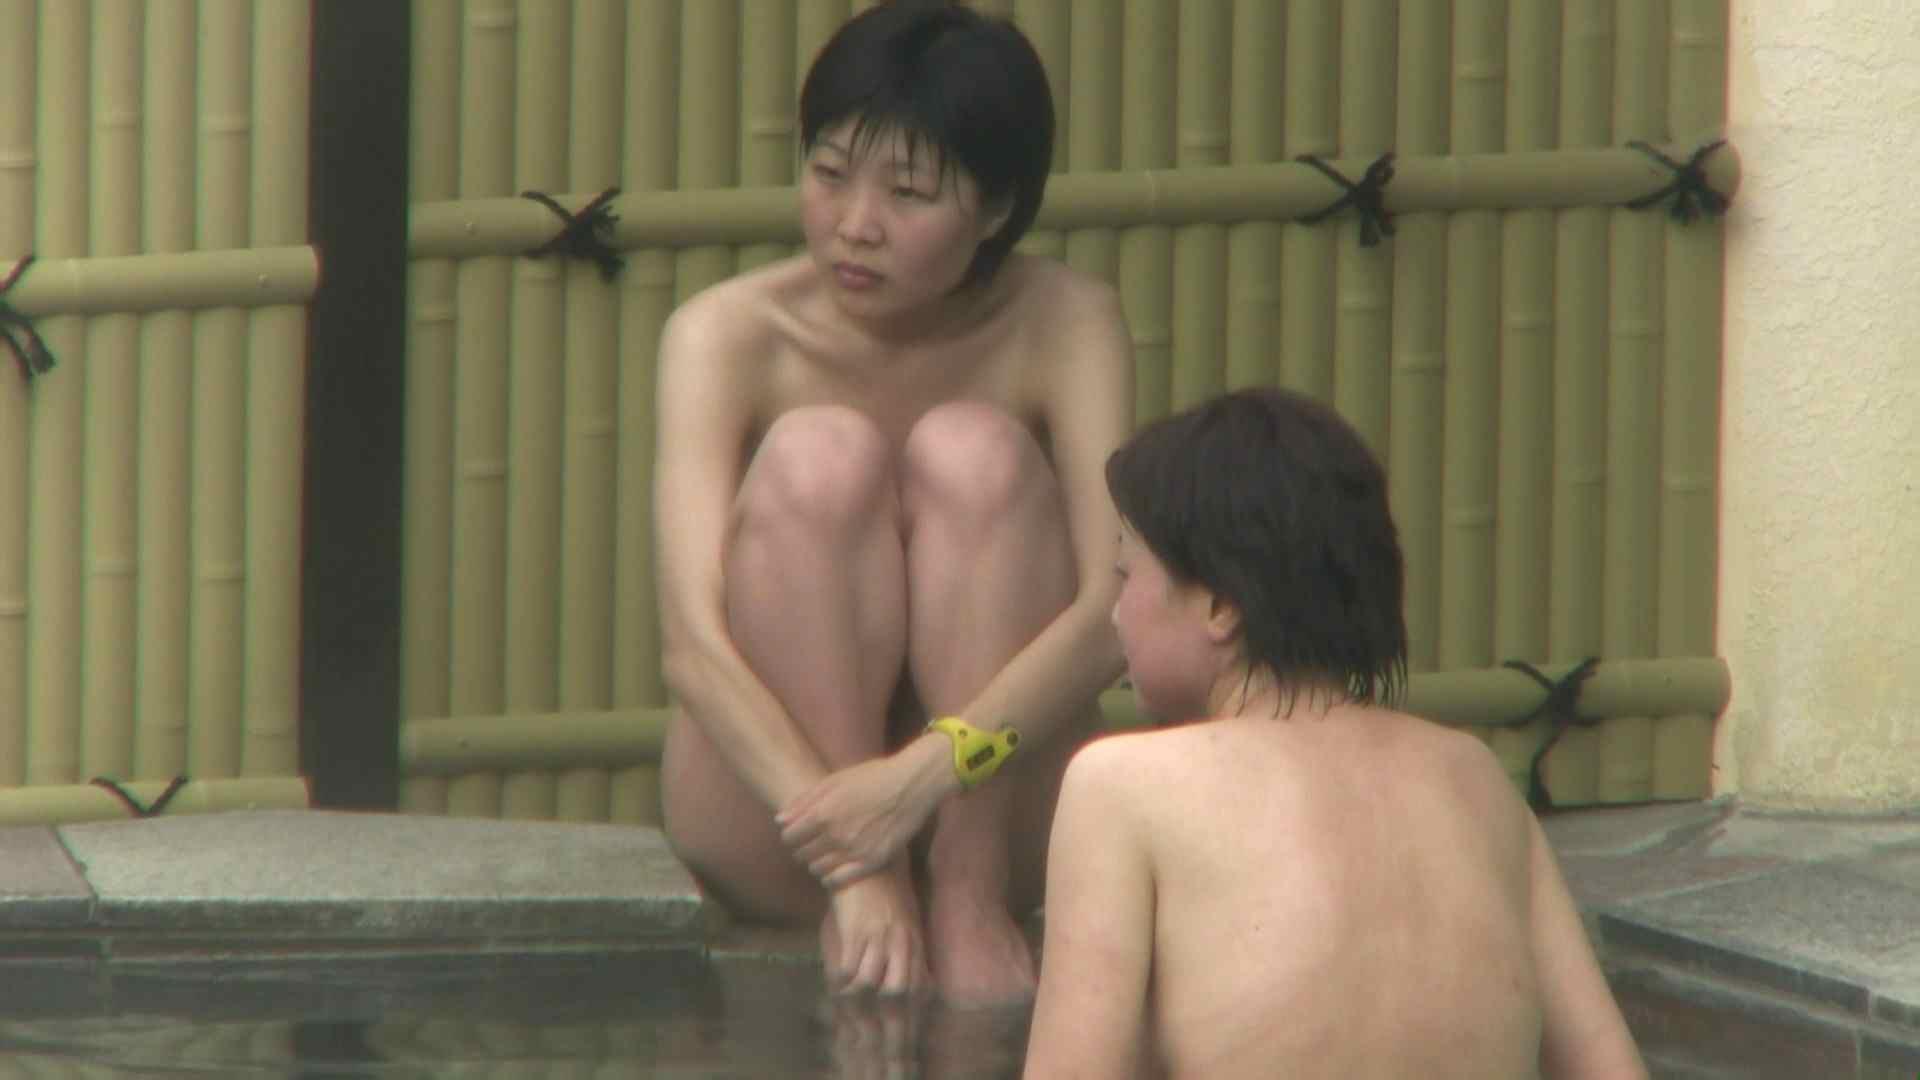 Aquaな露天風呂Vol.74【VIP限定】 盗撮 隠し撮りオマンコ動画紹介 68画像 44